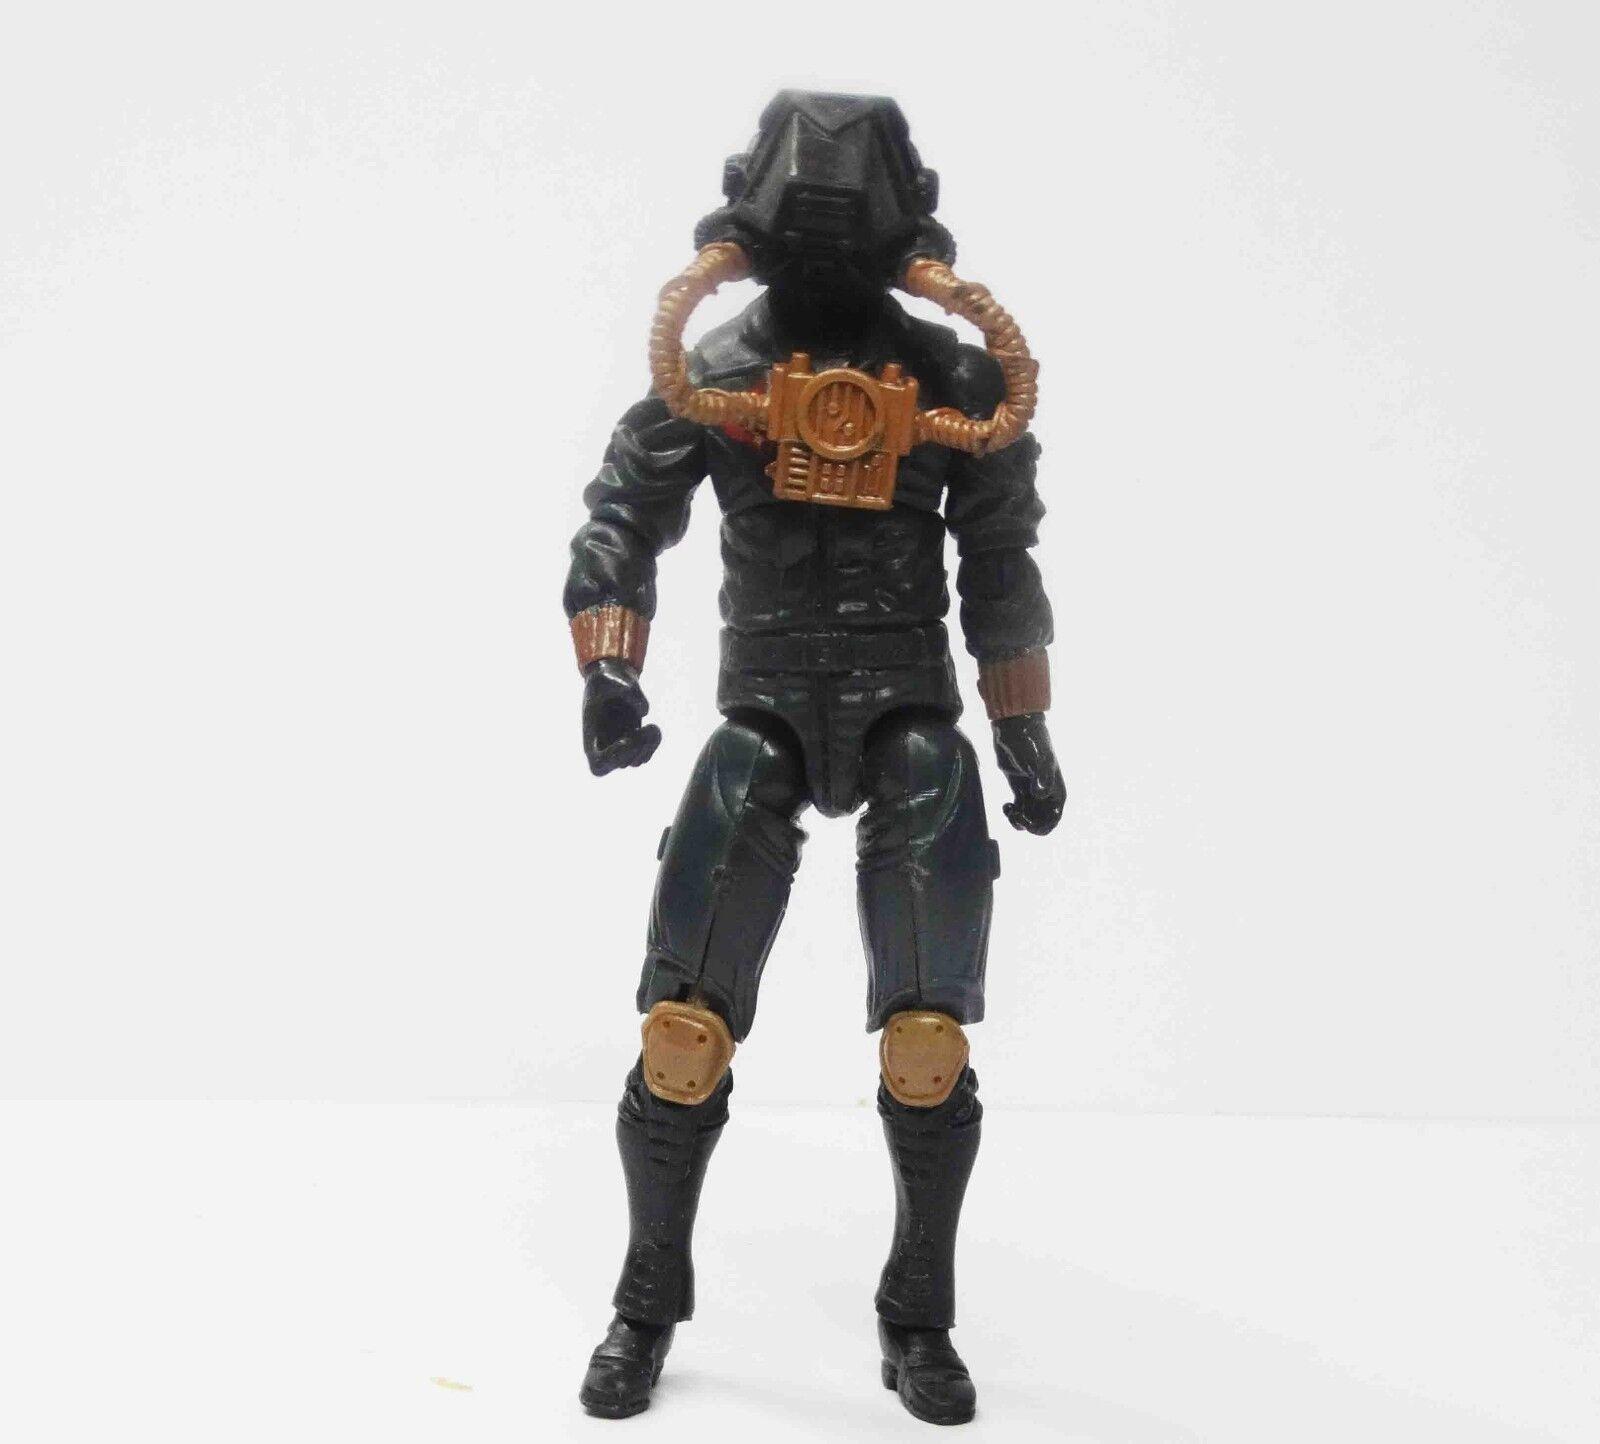 GI JOE COBRA  ARMY action figure  3.75